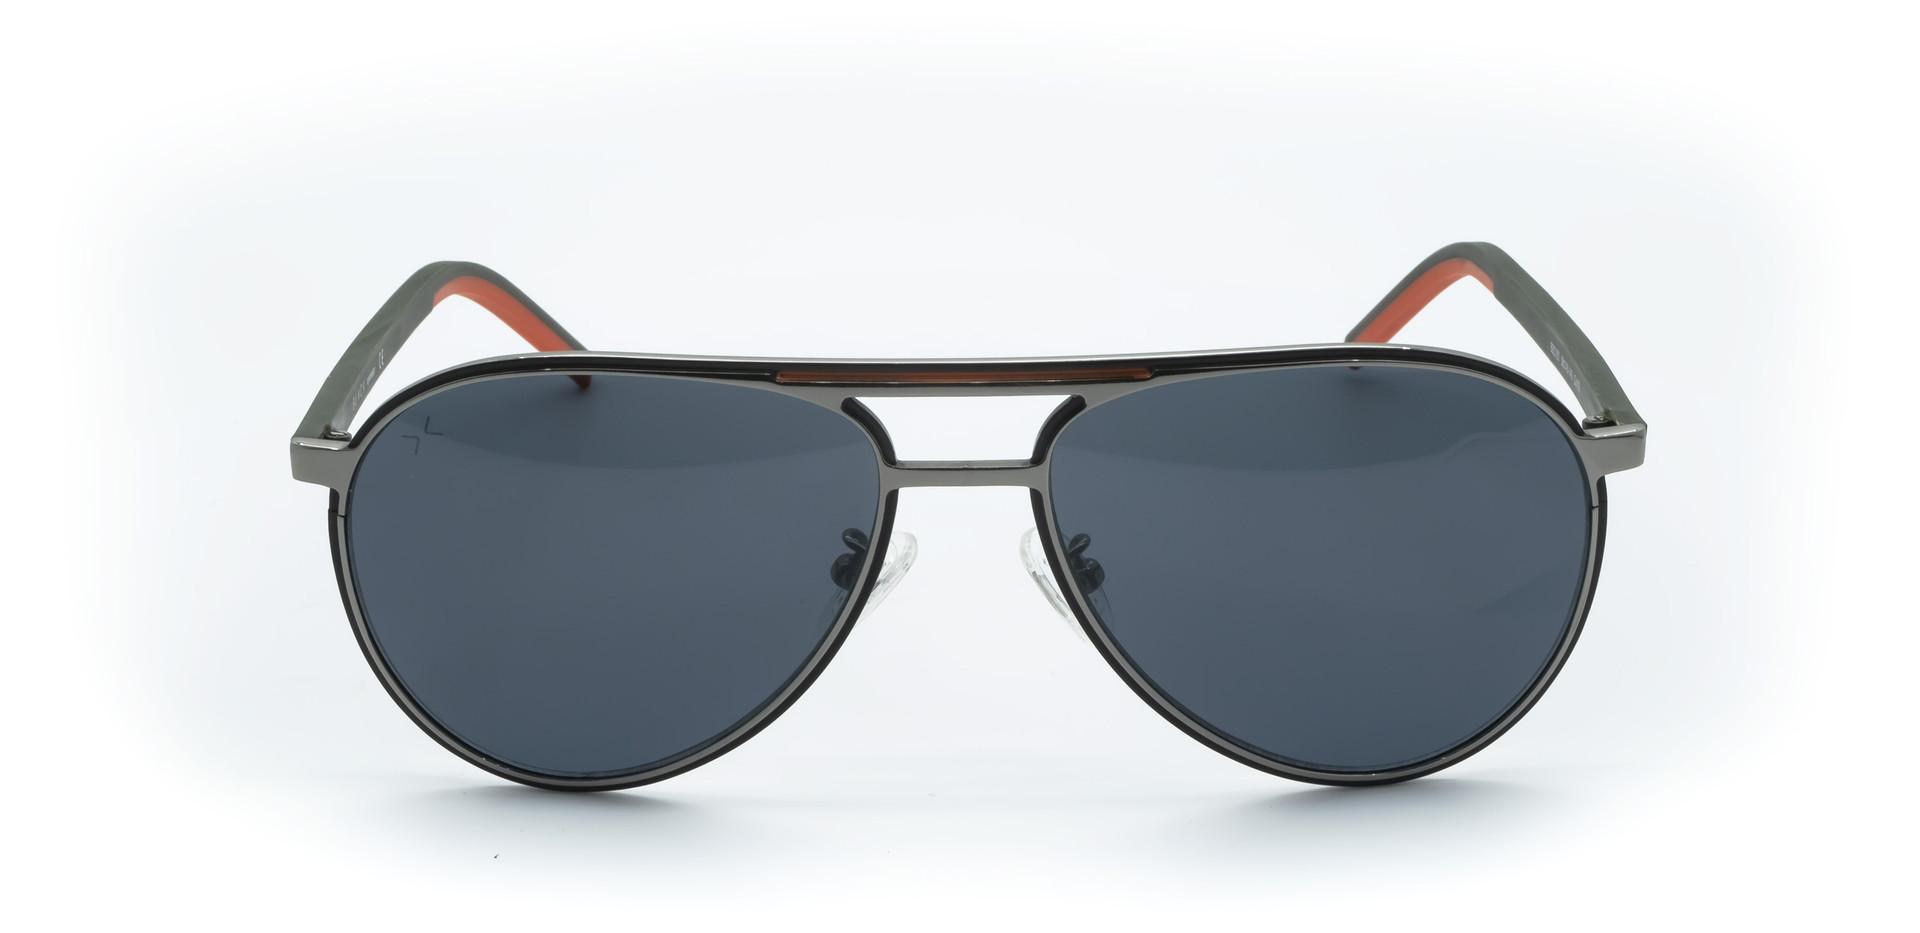 BlackEyewear_ModelBSC183Col03_Front.jpg